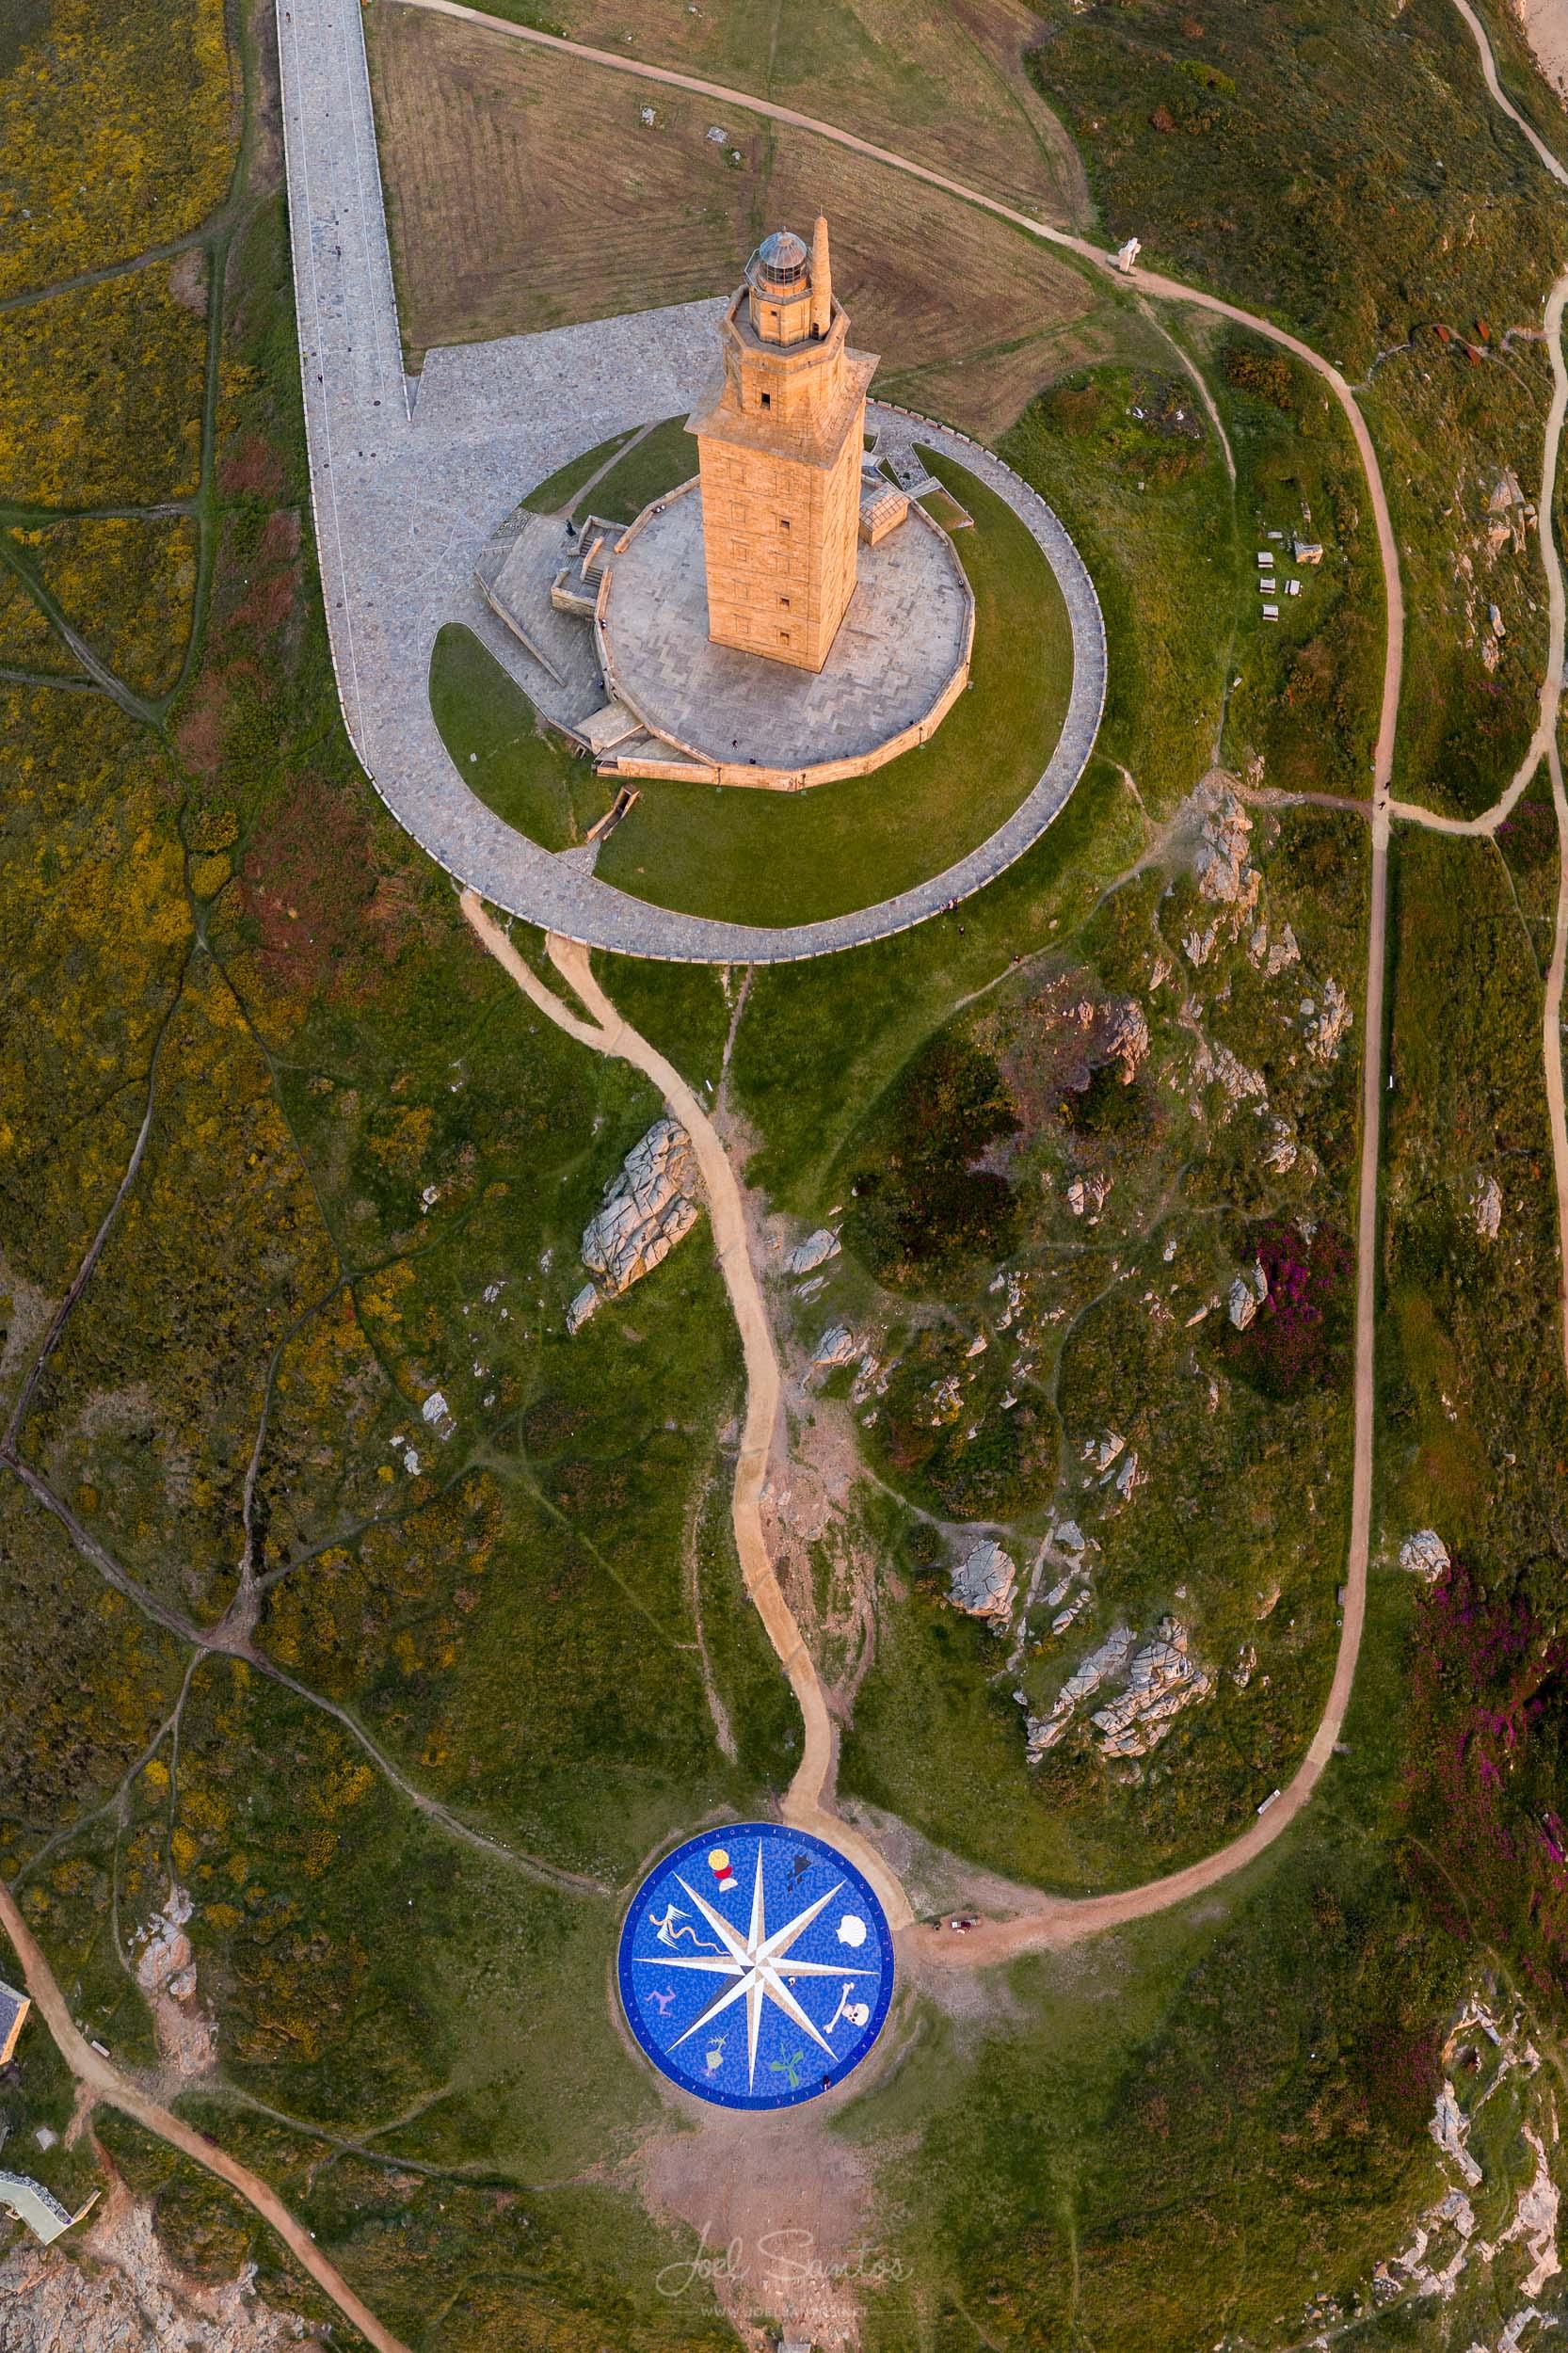 Torre de Hercules, Coruña, Spain